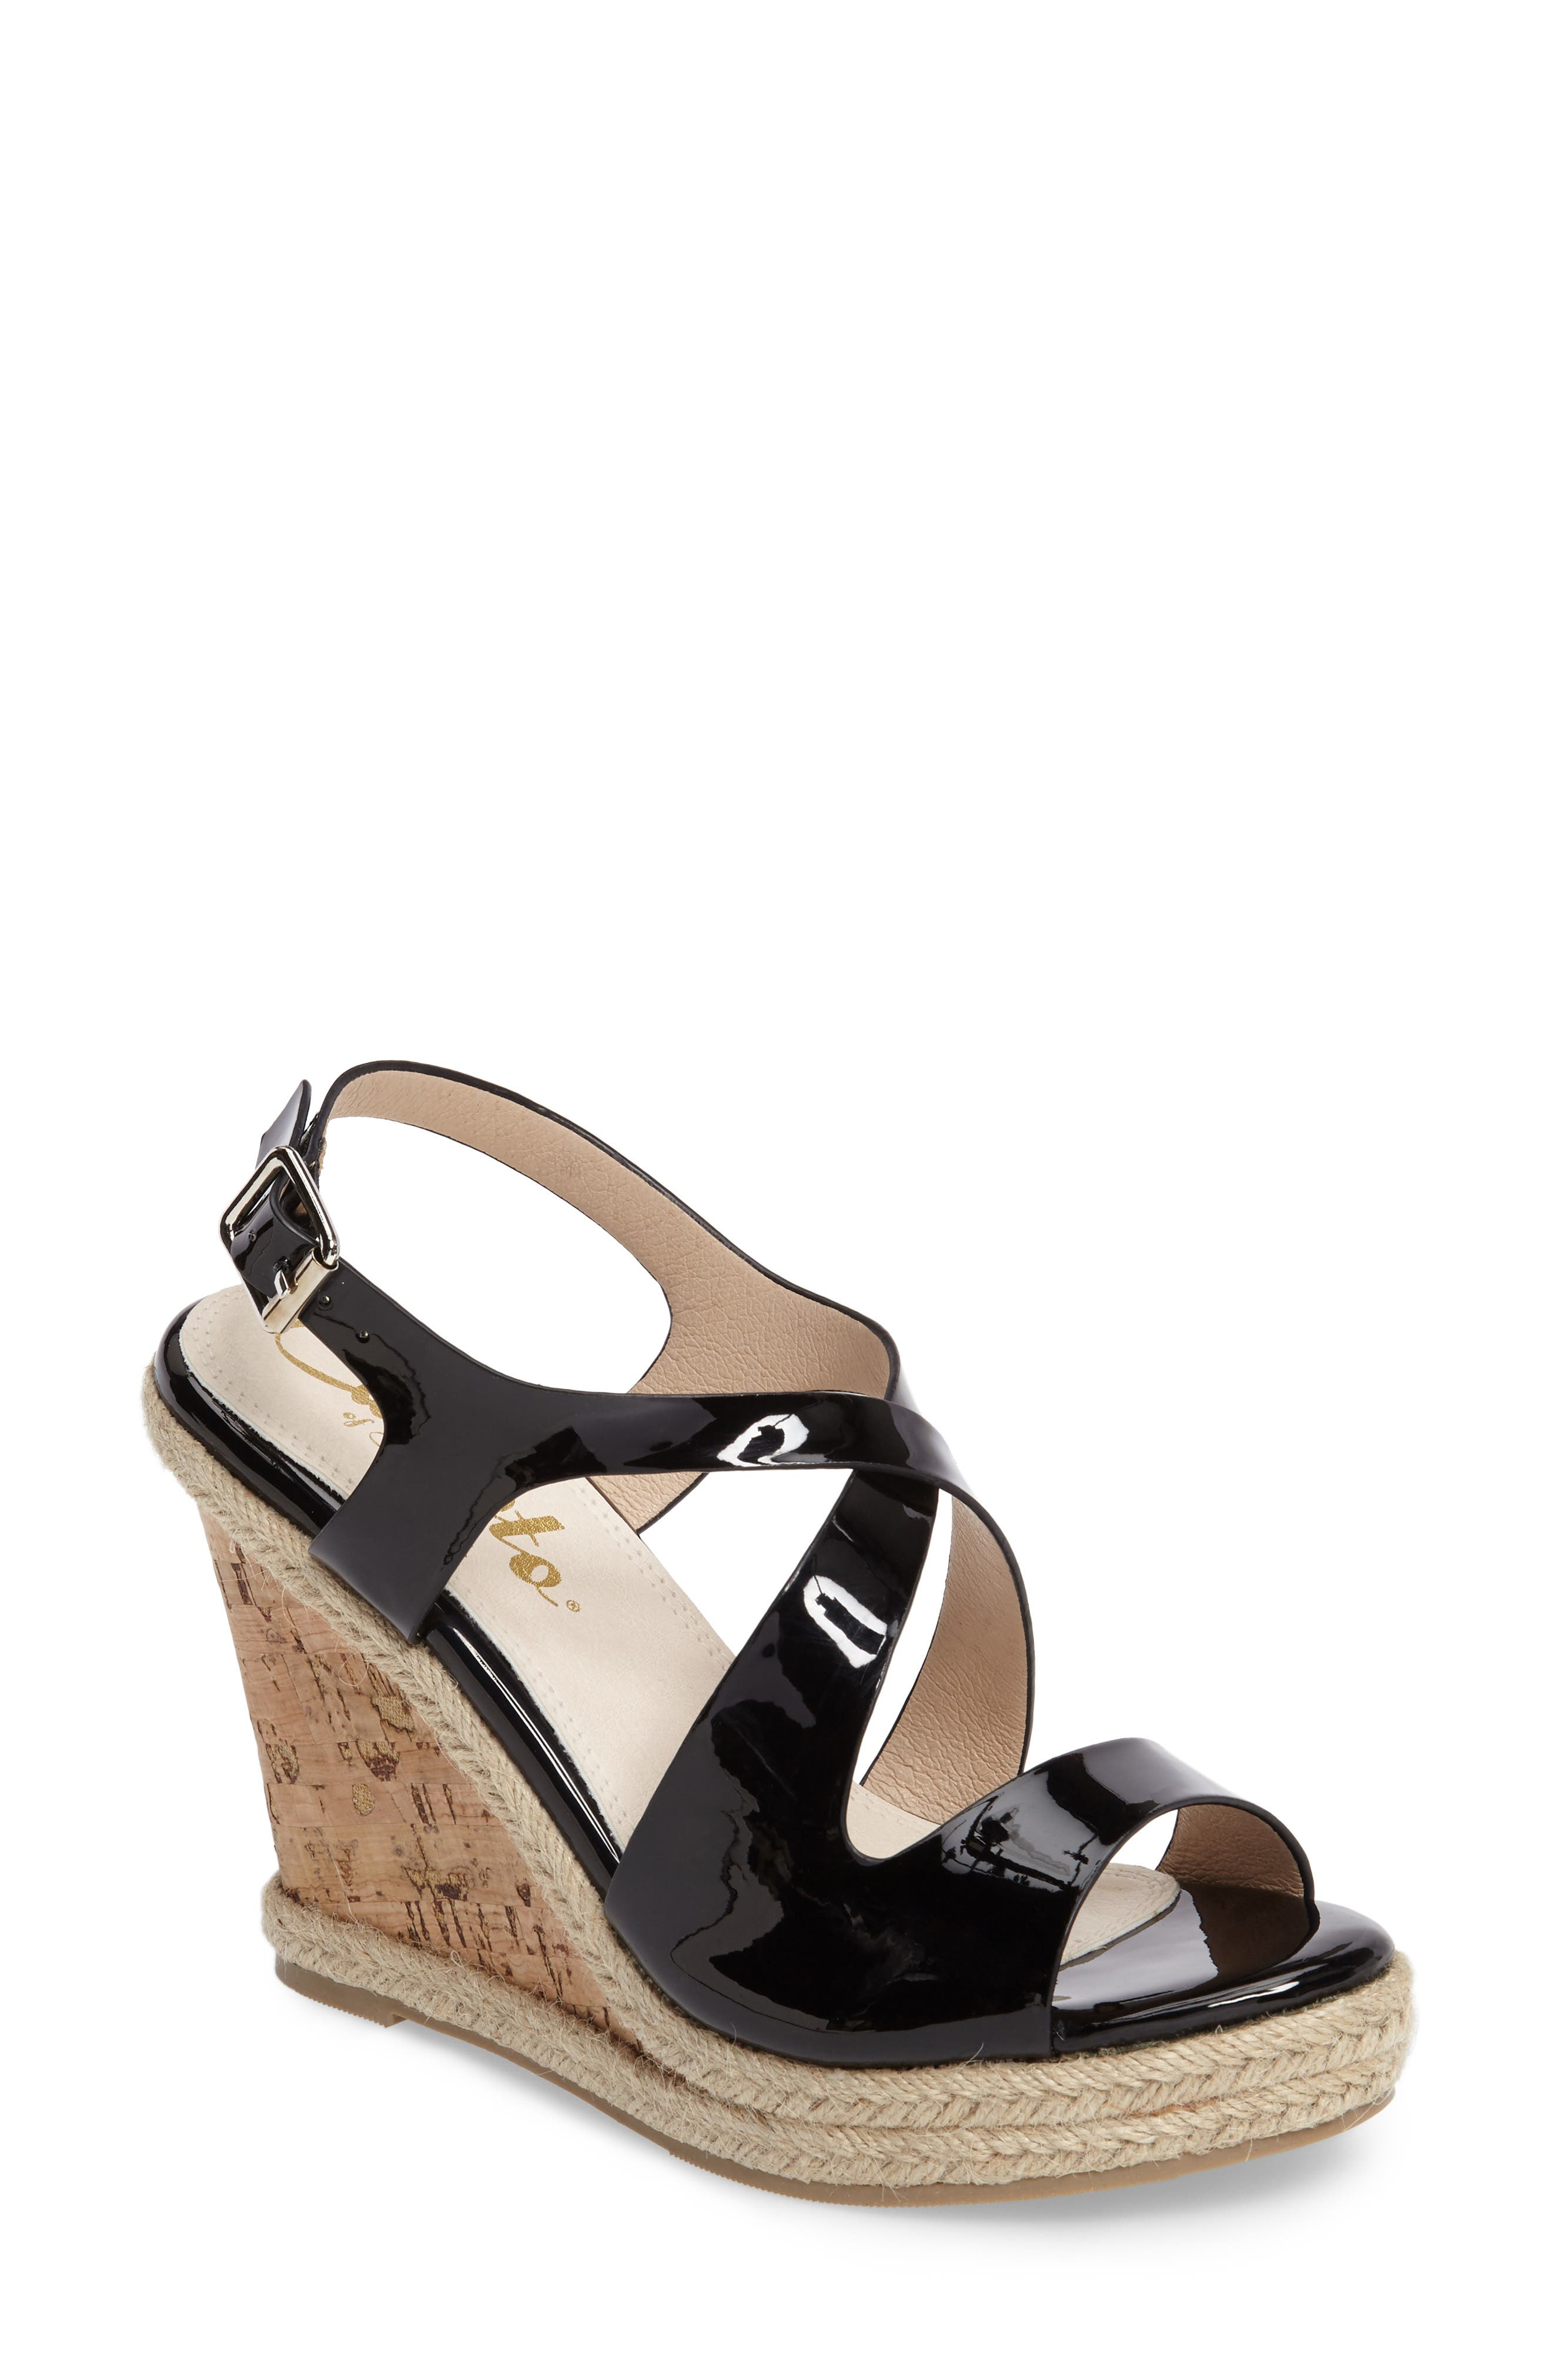 Alternate Image 1 Selected - Callisto Brielle Wedge Sandal (Women)